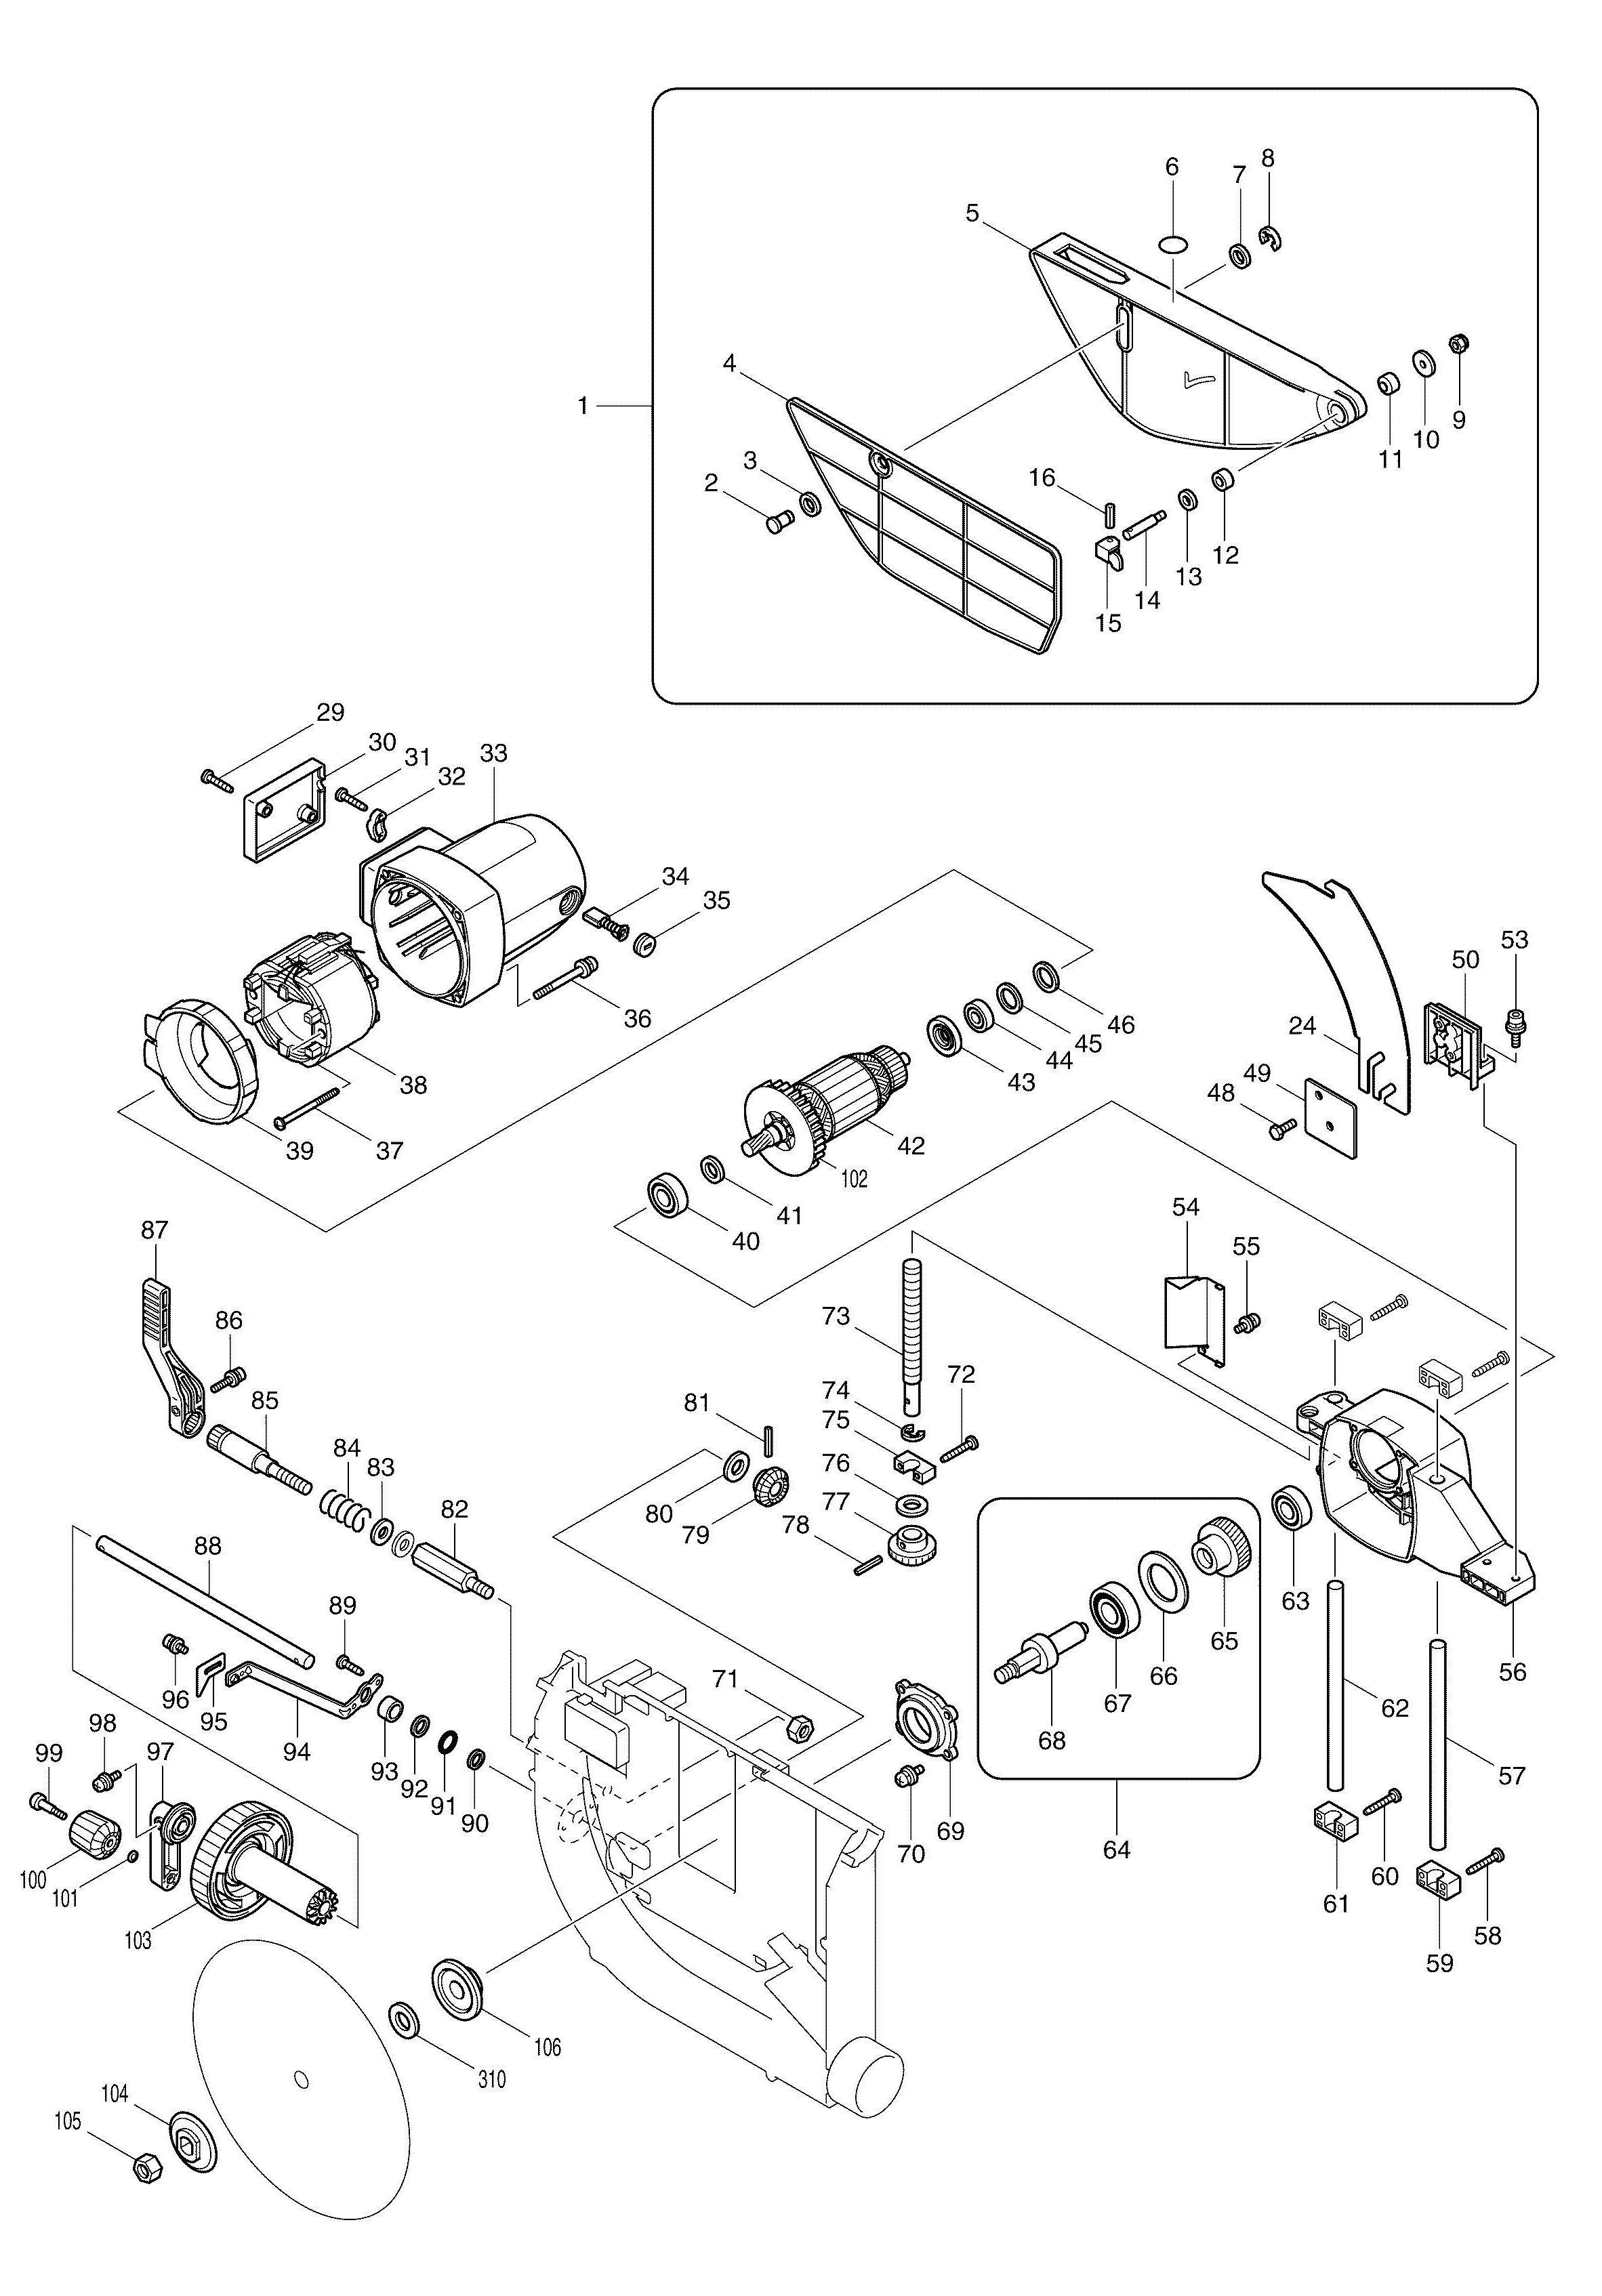 Makita Table Saw Wiring Diagram Online Wiring Diagram